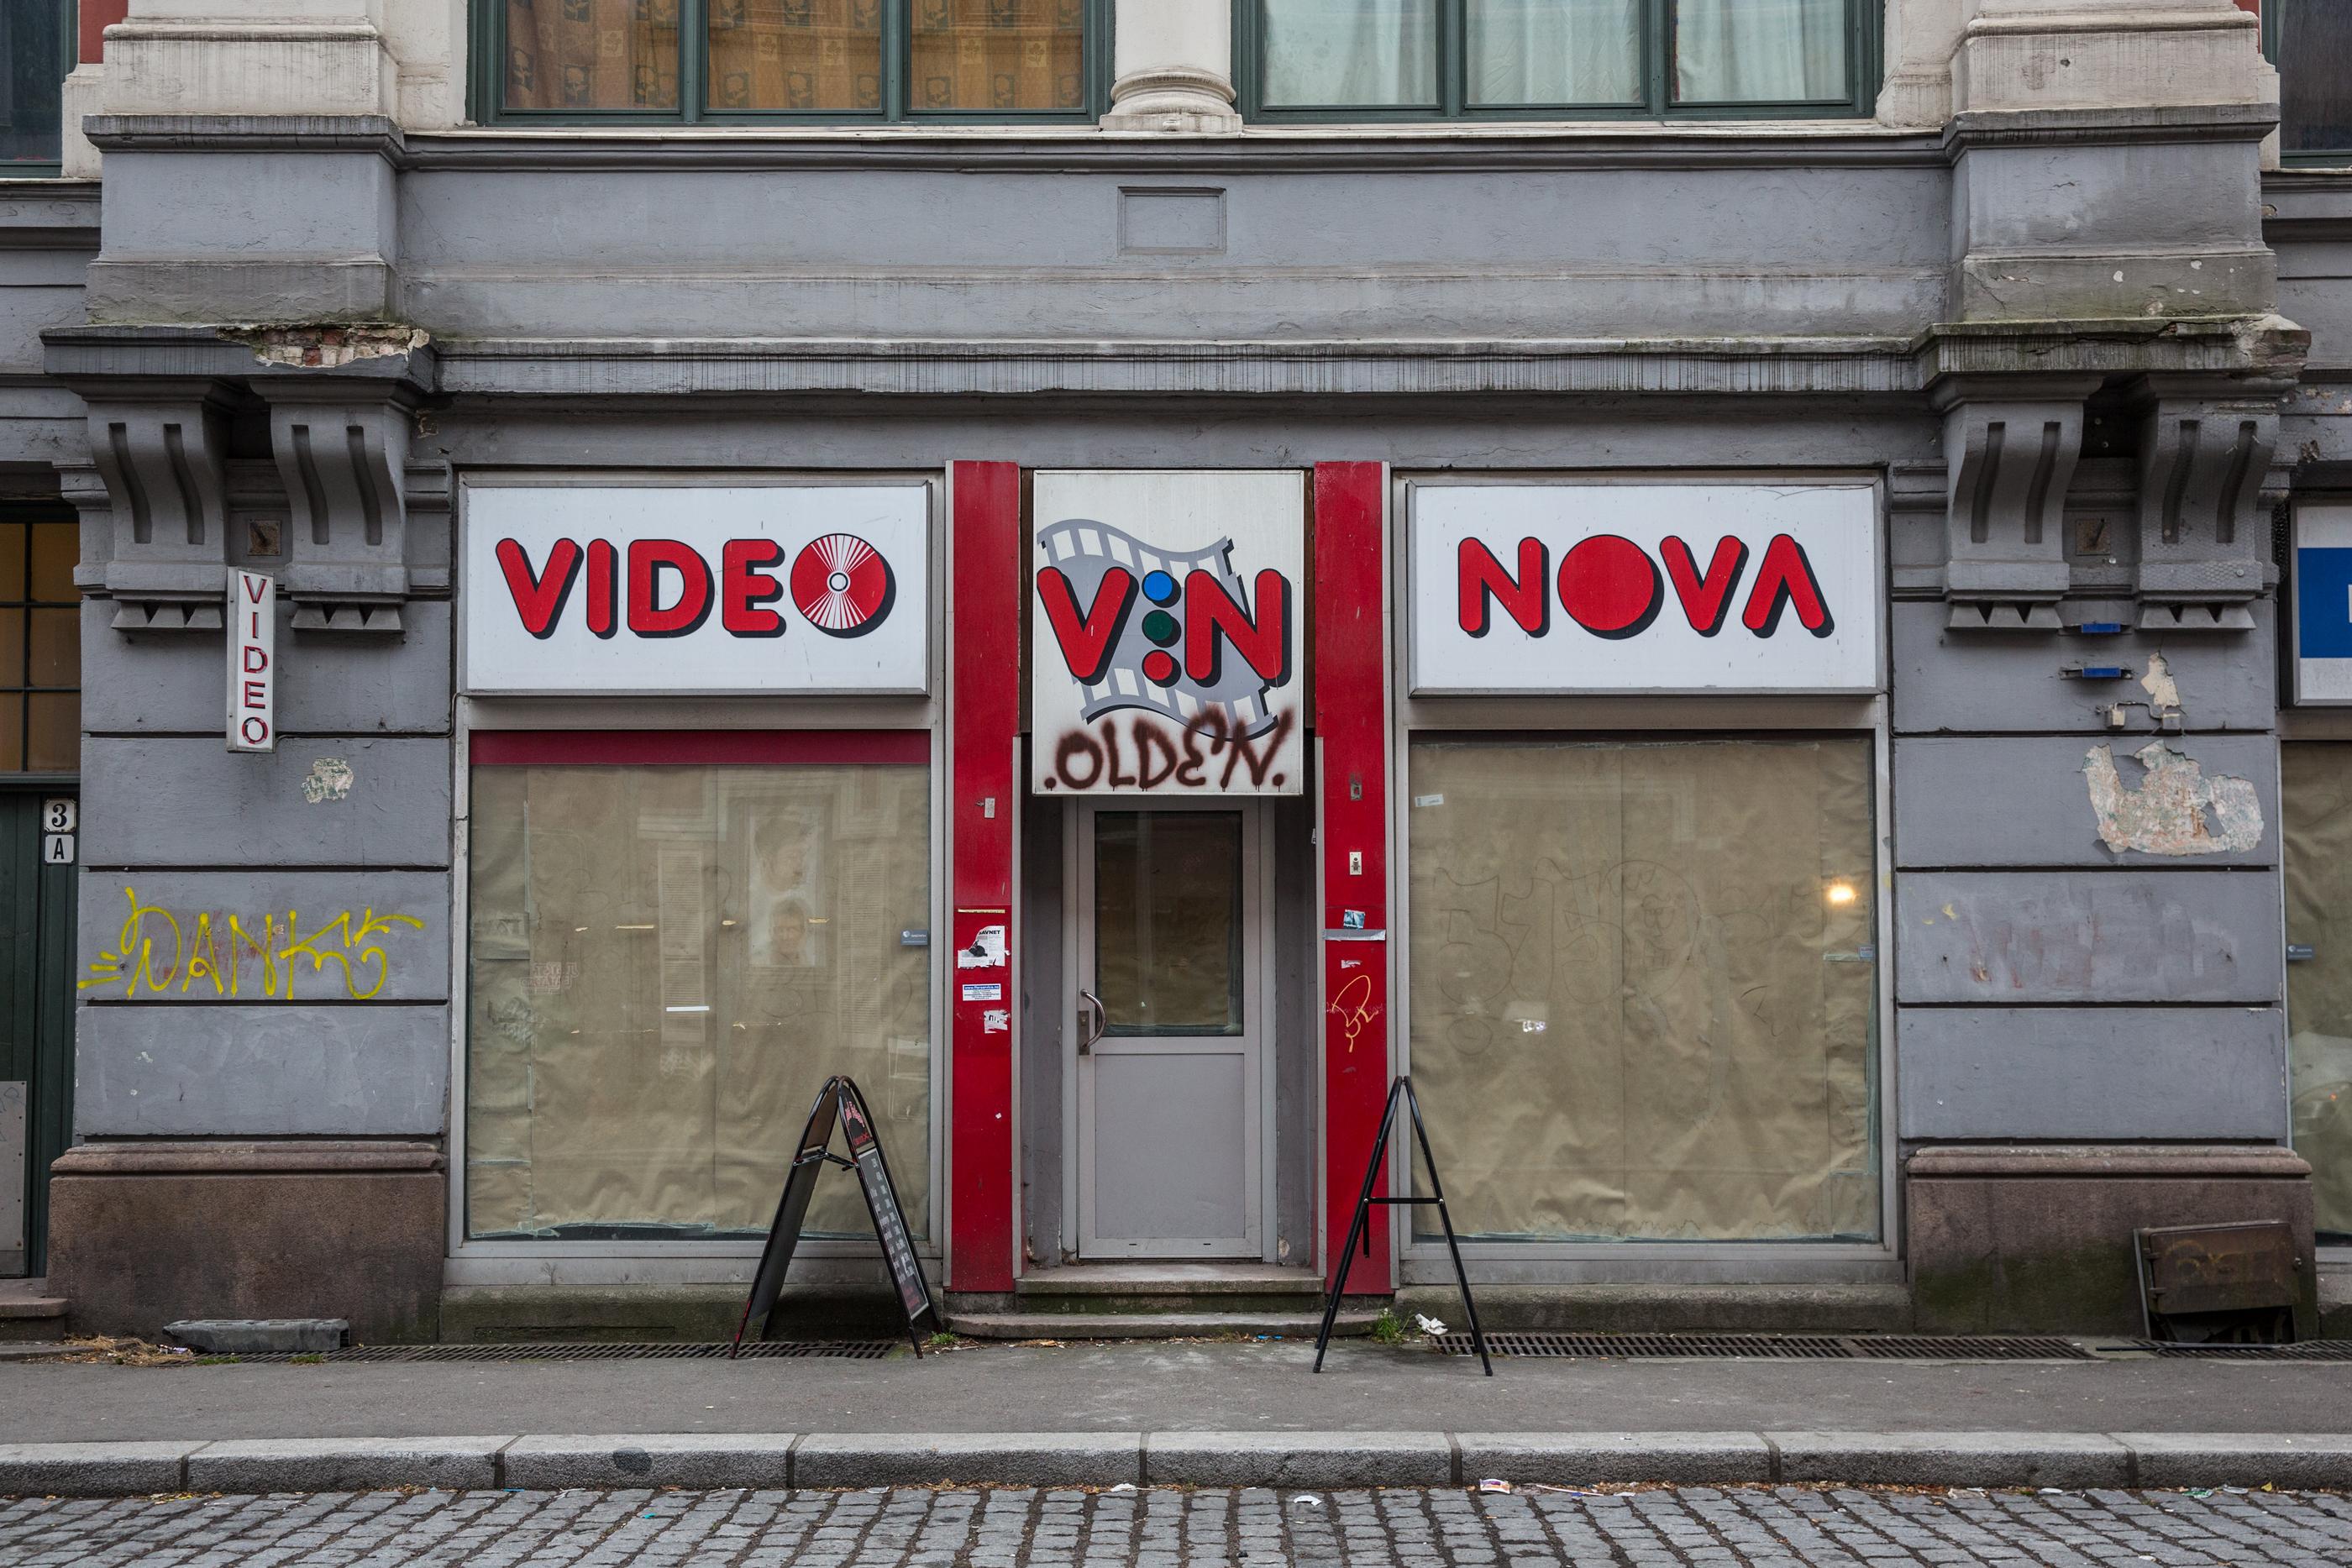 Video Nova